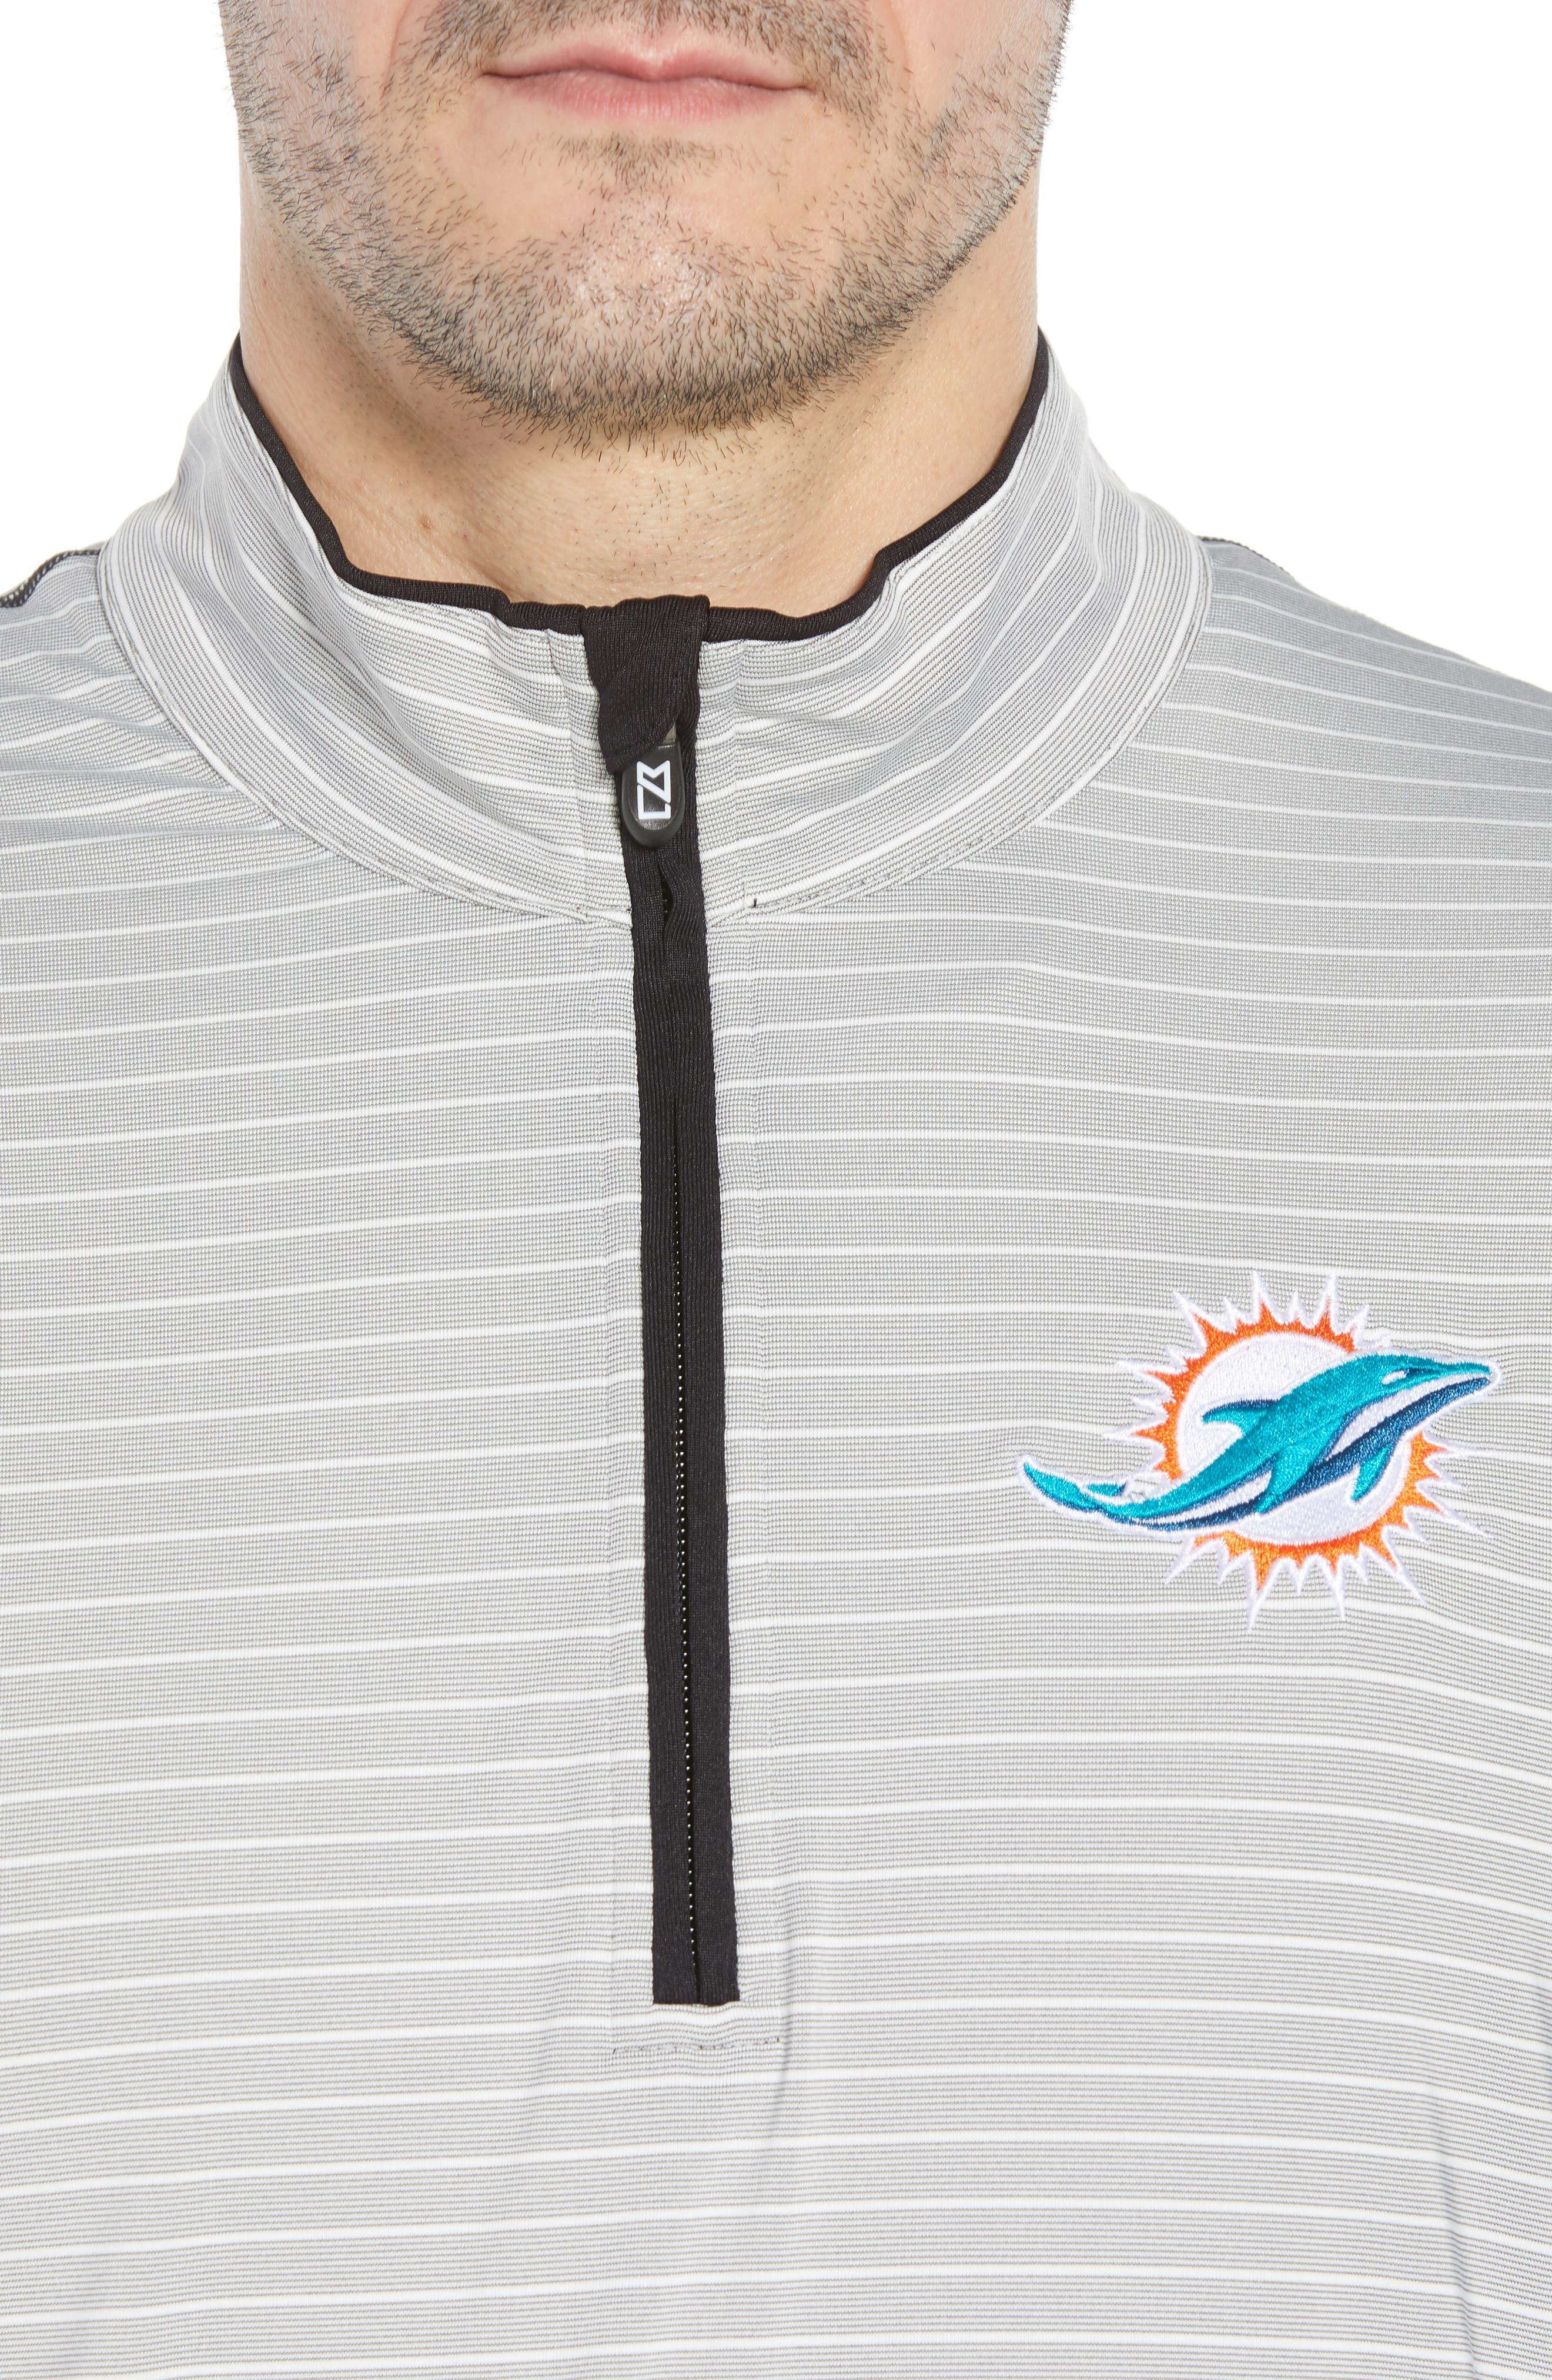 Meridian - Miami Dolphins Regular Fit Half Zip Pullover,                             Alternate thumbnail 4, color,                             BLACK